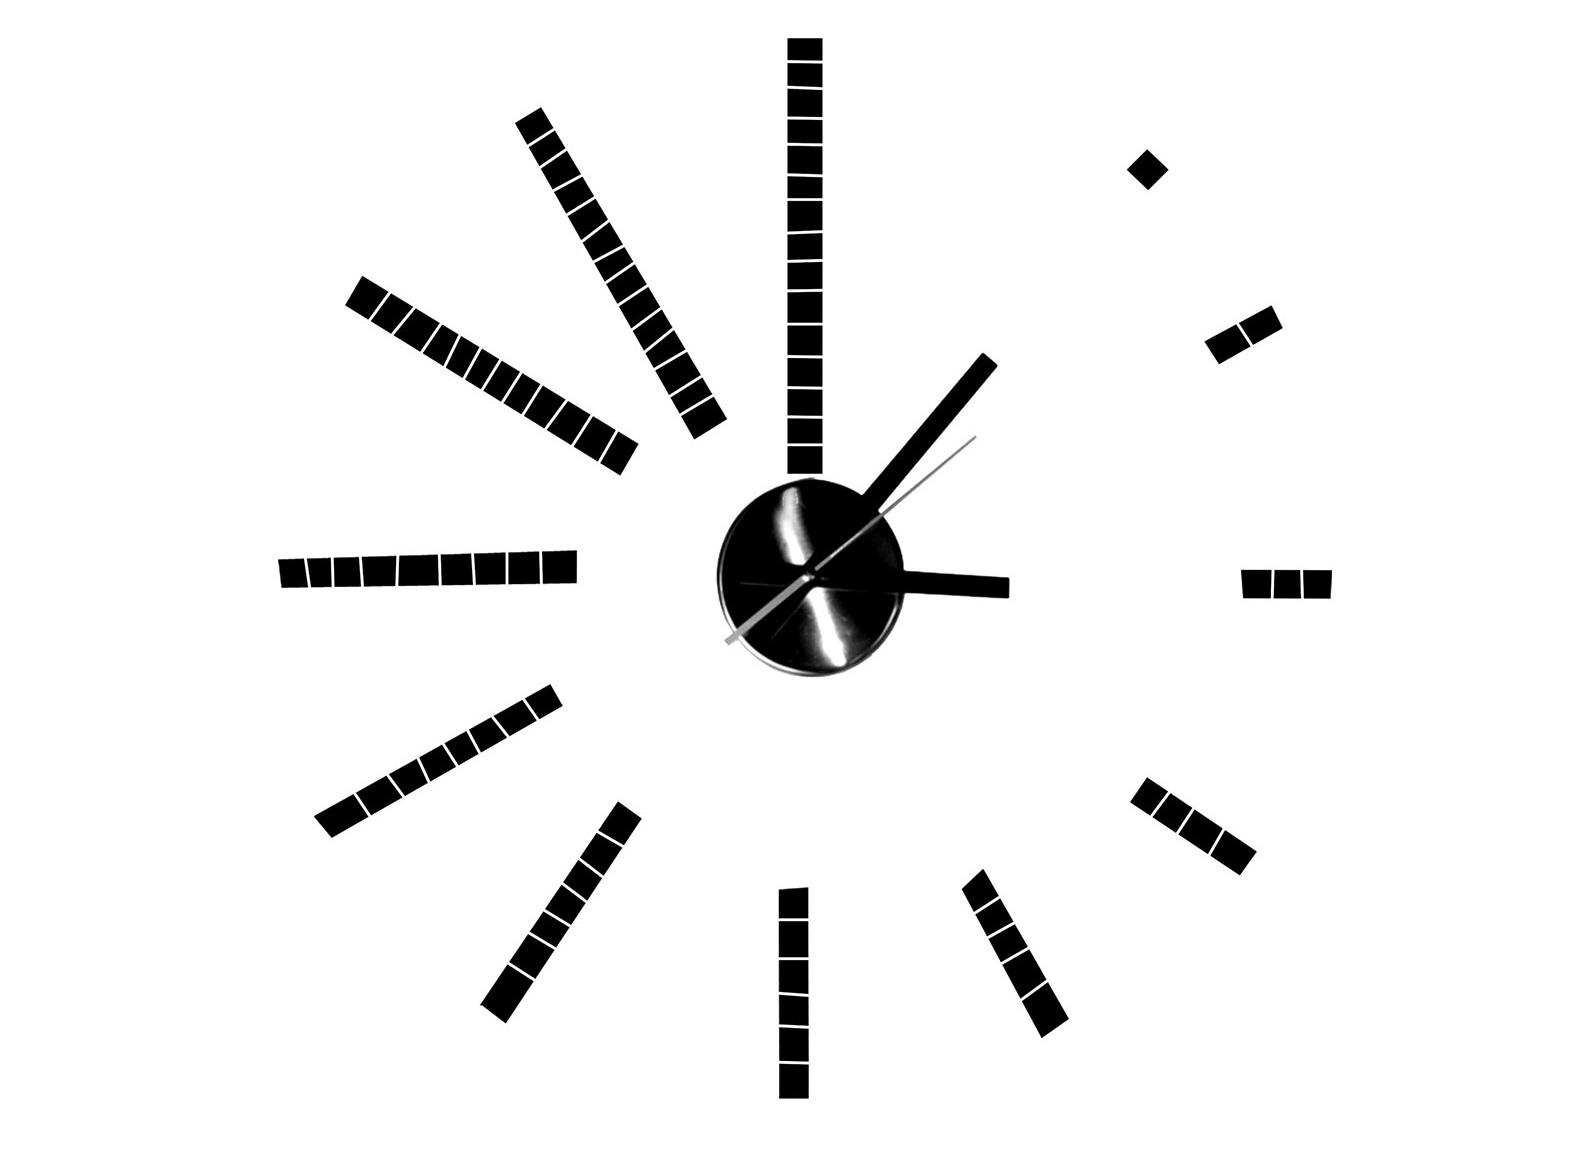 Часы STICKERНастенные часы<br>кварцевый механизм<br><br>Material: Пластик<br>Length см: None<br>Width см: 25<br>Depth см: 5<br>Height см: 25